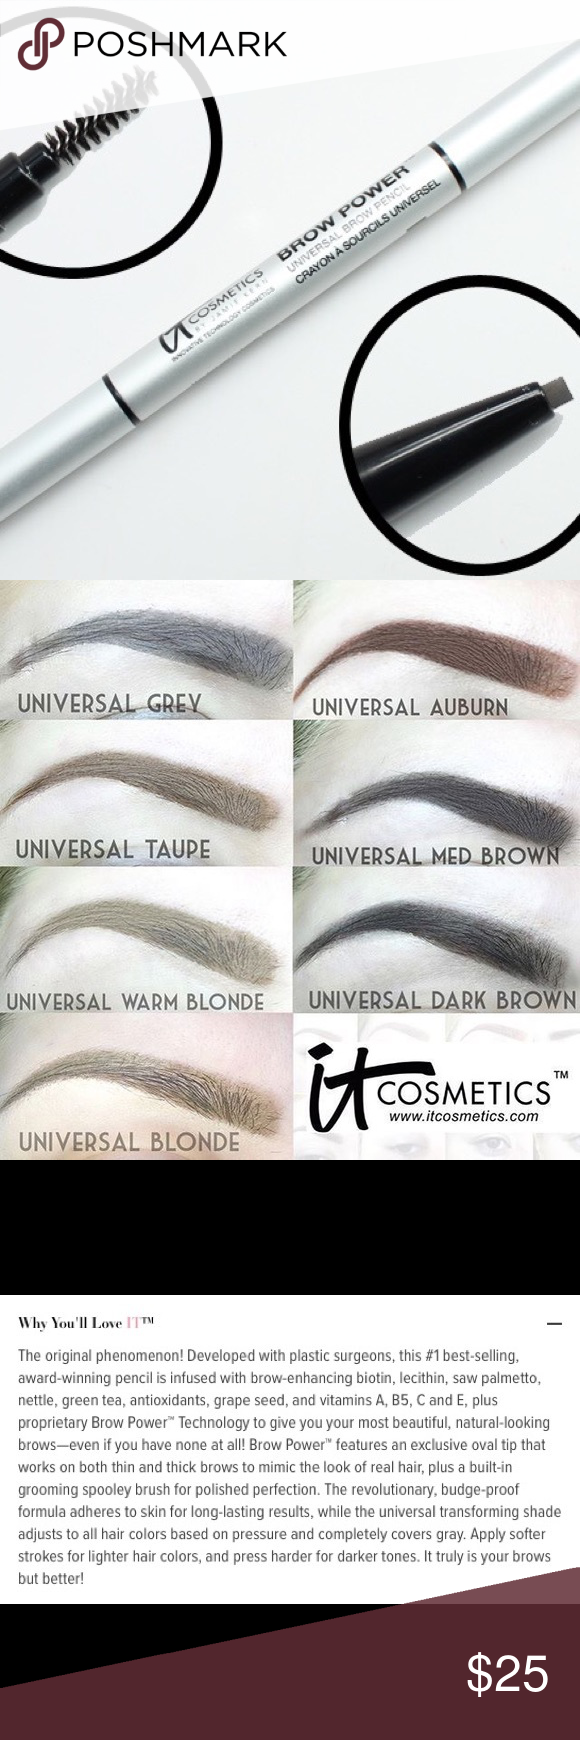 It Cosmetics Brow Power Universal Eyebrow Pencil It Cosmetics